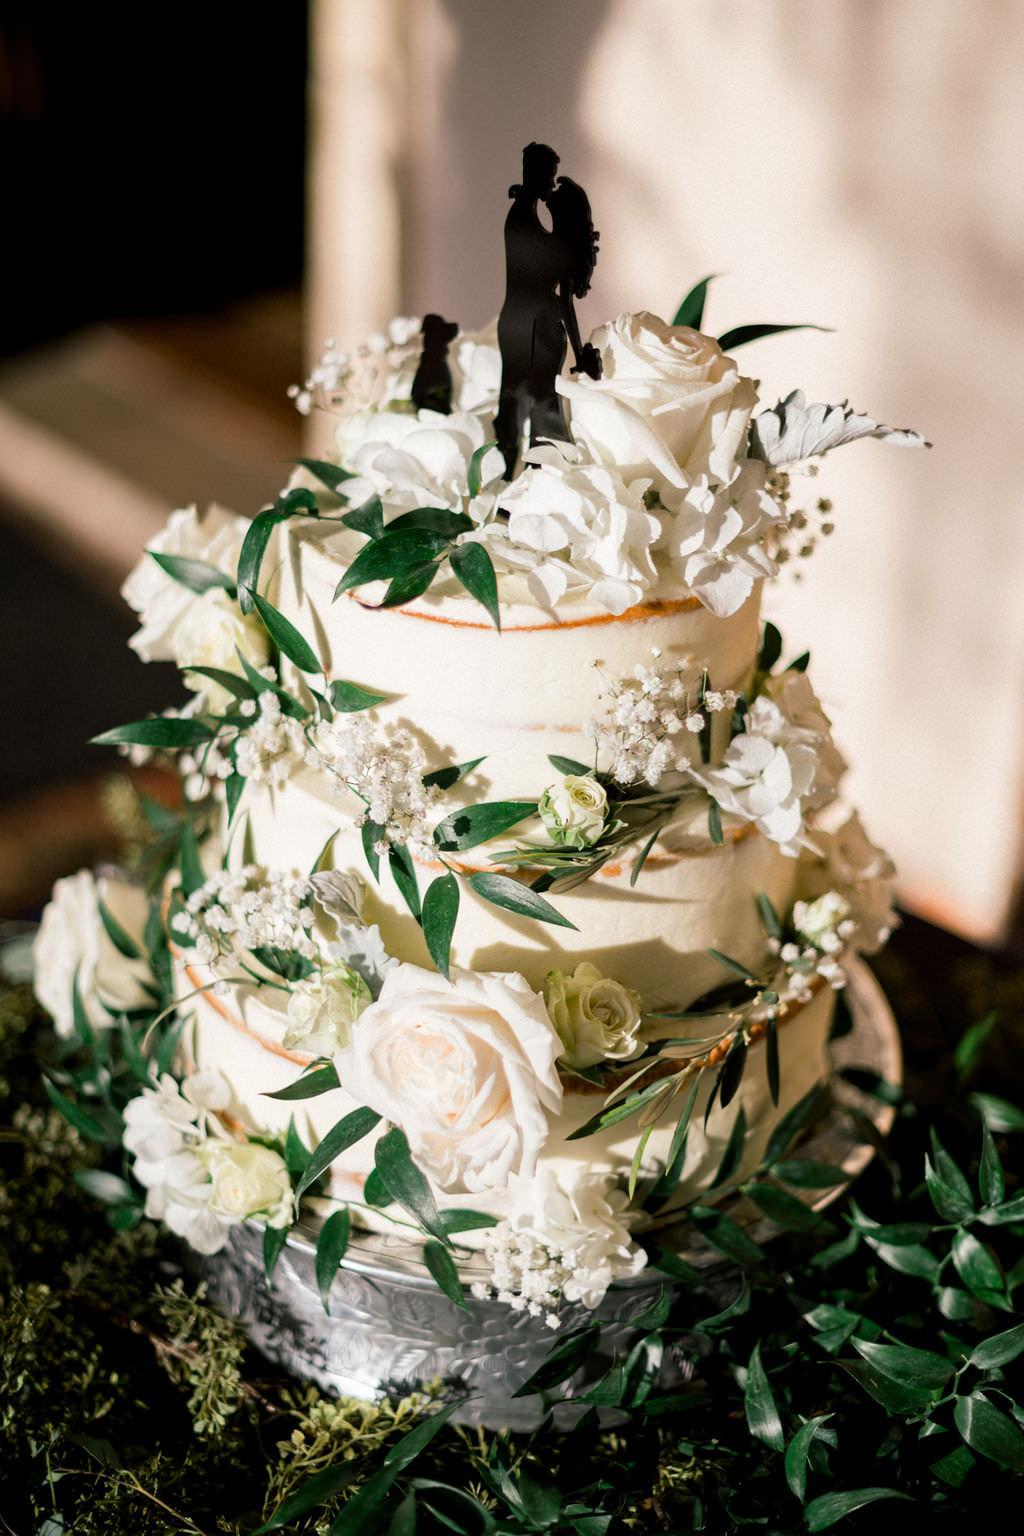 Outdoor, Boho Inspired Semi Naked Wedding Cake, White Frosting, Ivory Florals, Blush Pink Roses, Greenery,